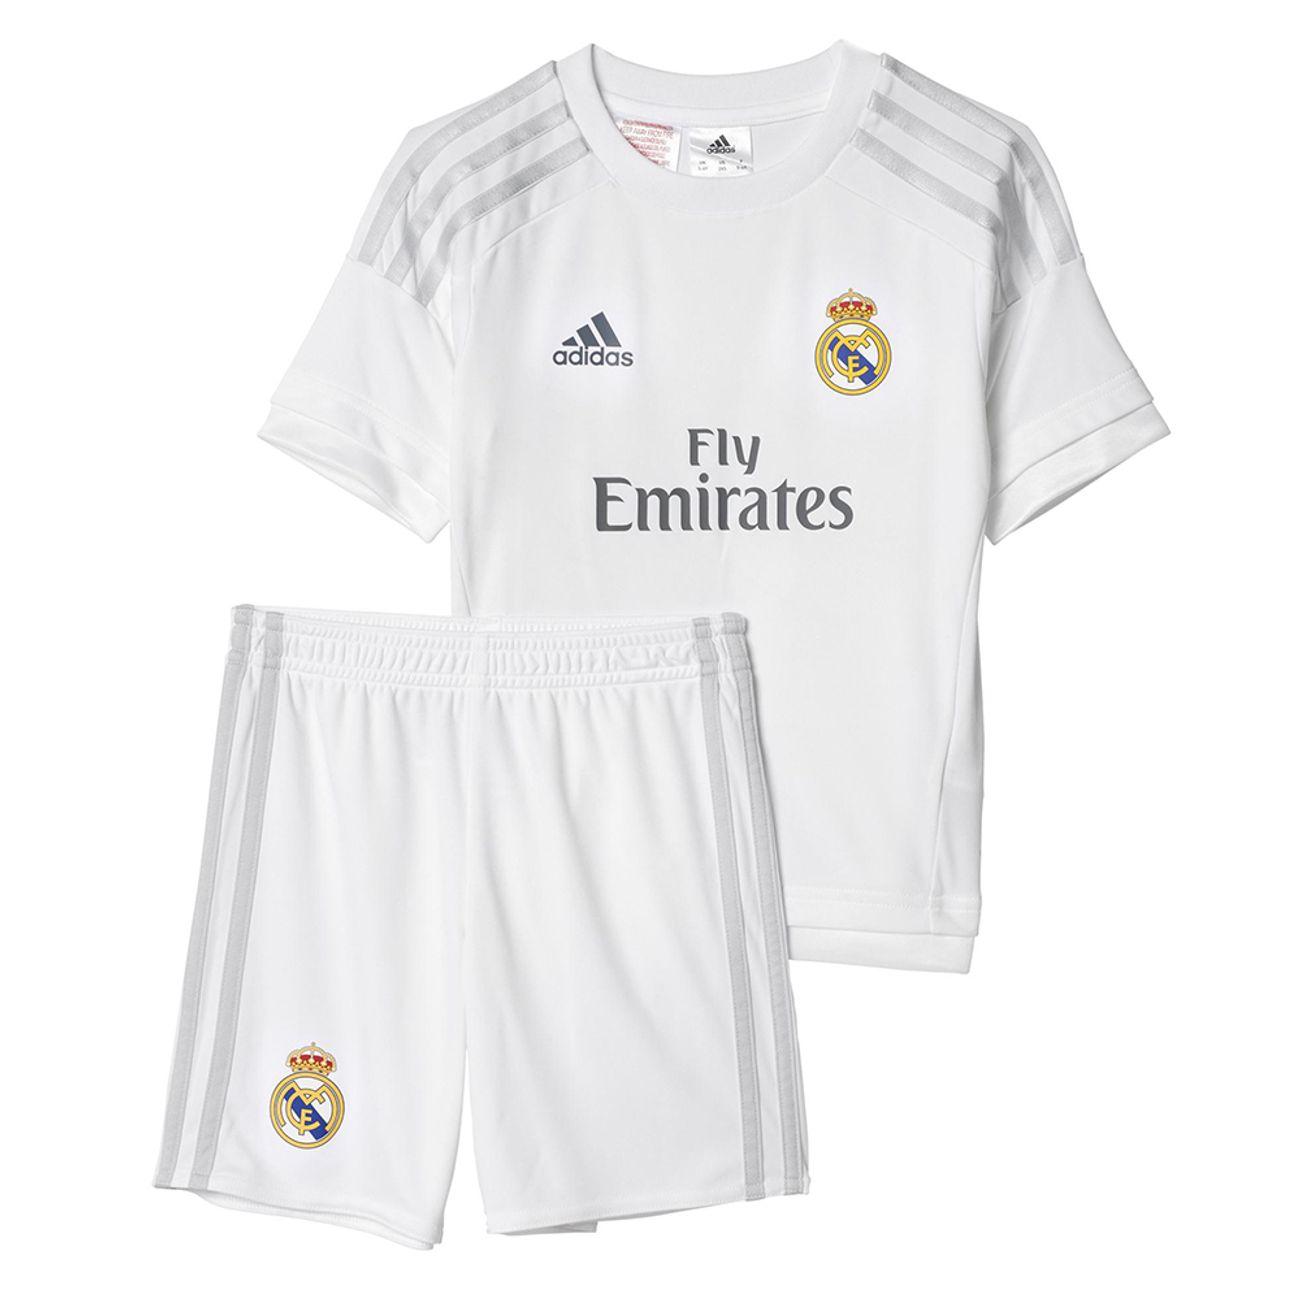 95832a45685f8 MAILLOT ADIDAS Clubs Adidas Performance Mini Kit Real Madrid 13 14 Enfant  ...